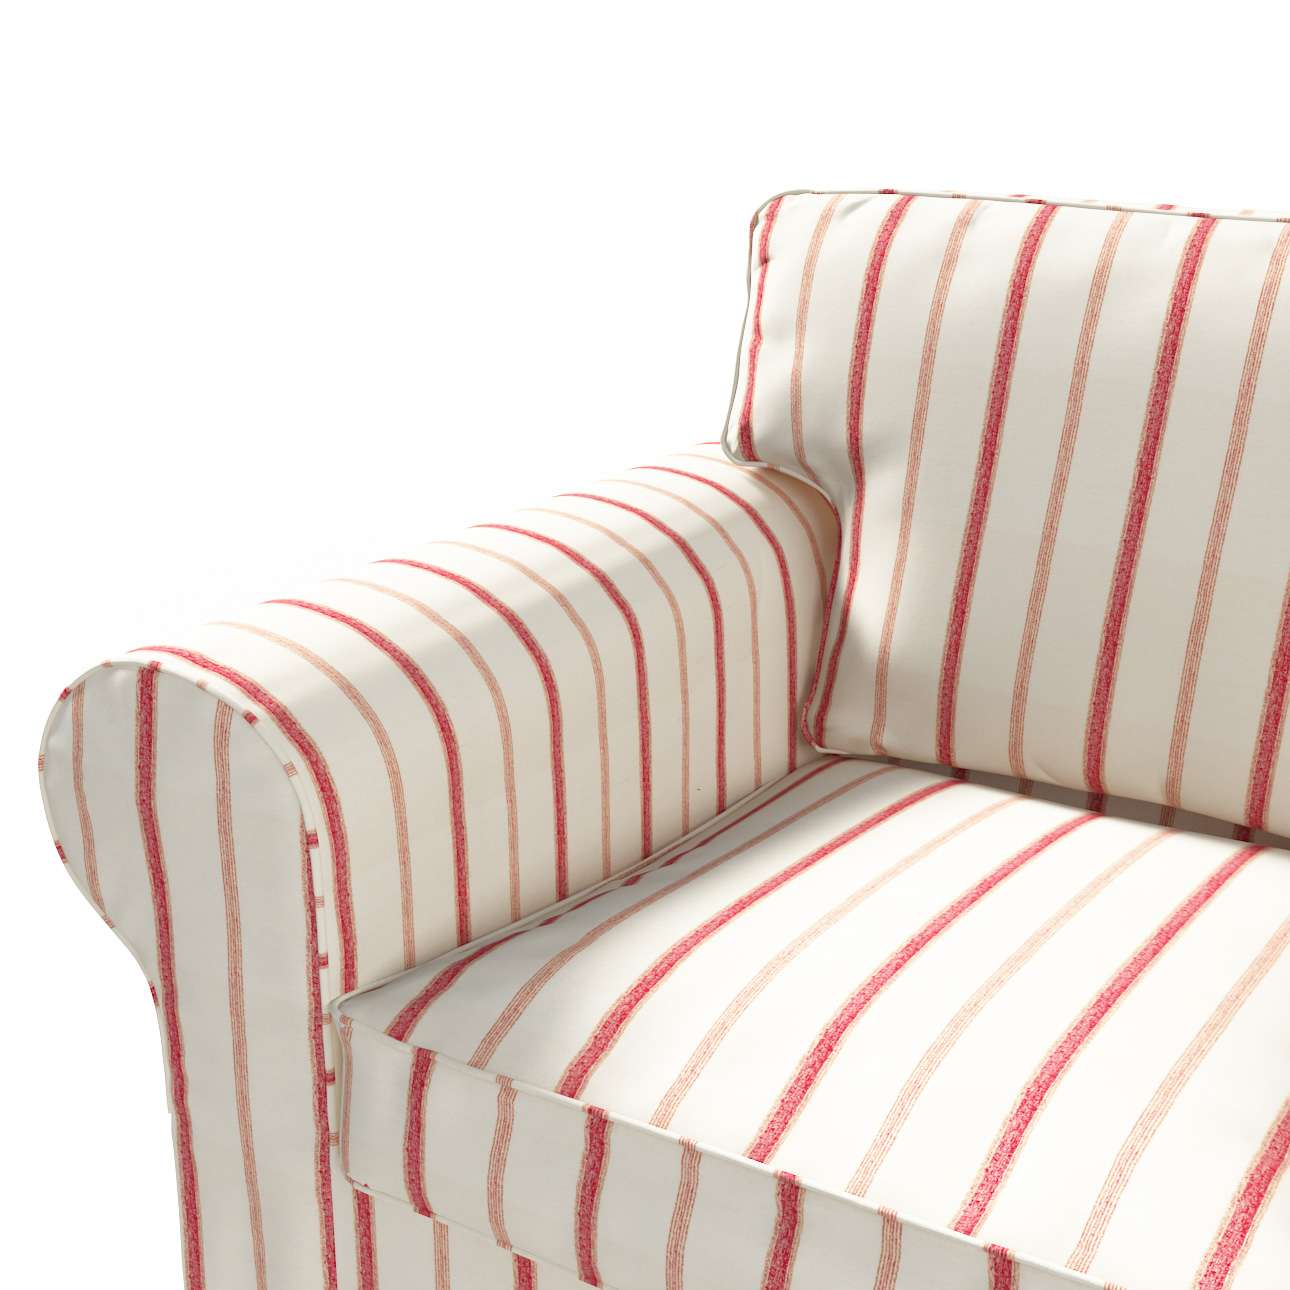 Ektorp 2-seater sofa cover Ektorp 2-seat sofa cover in collection Avinon, fabric: 129-15